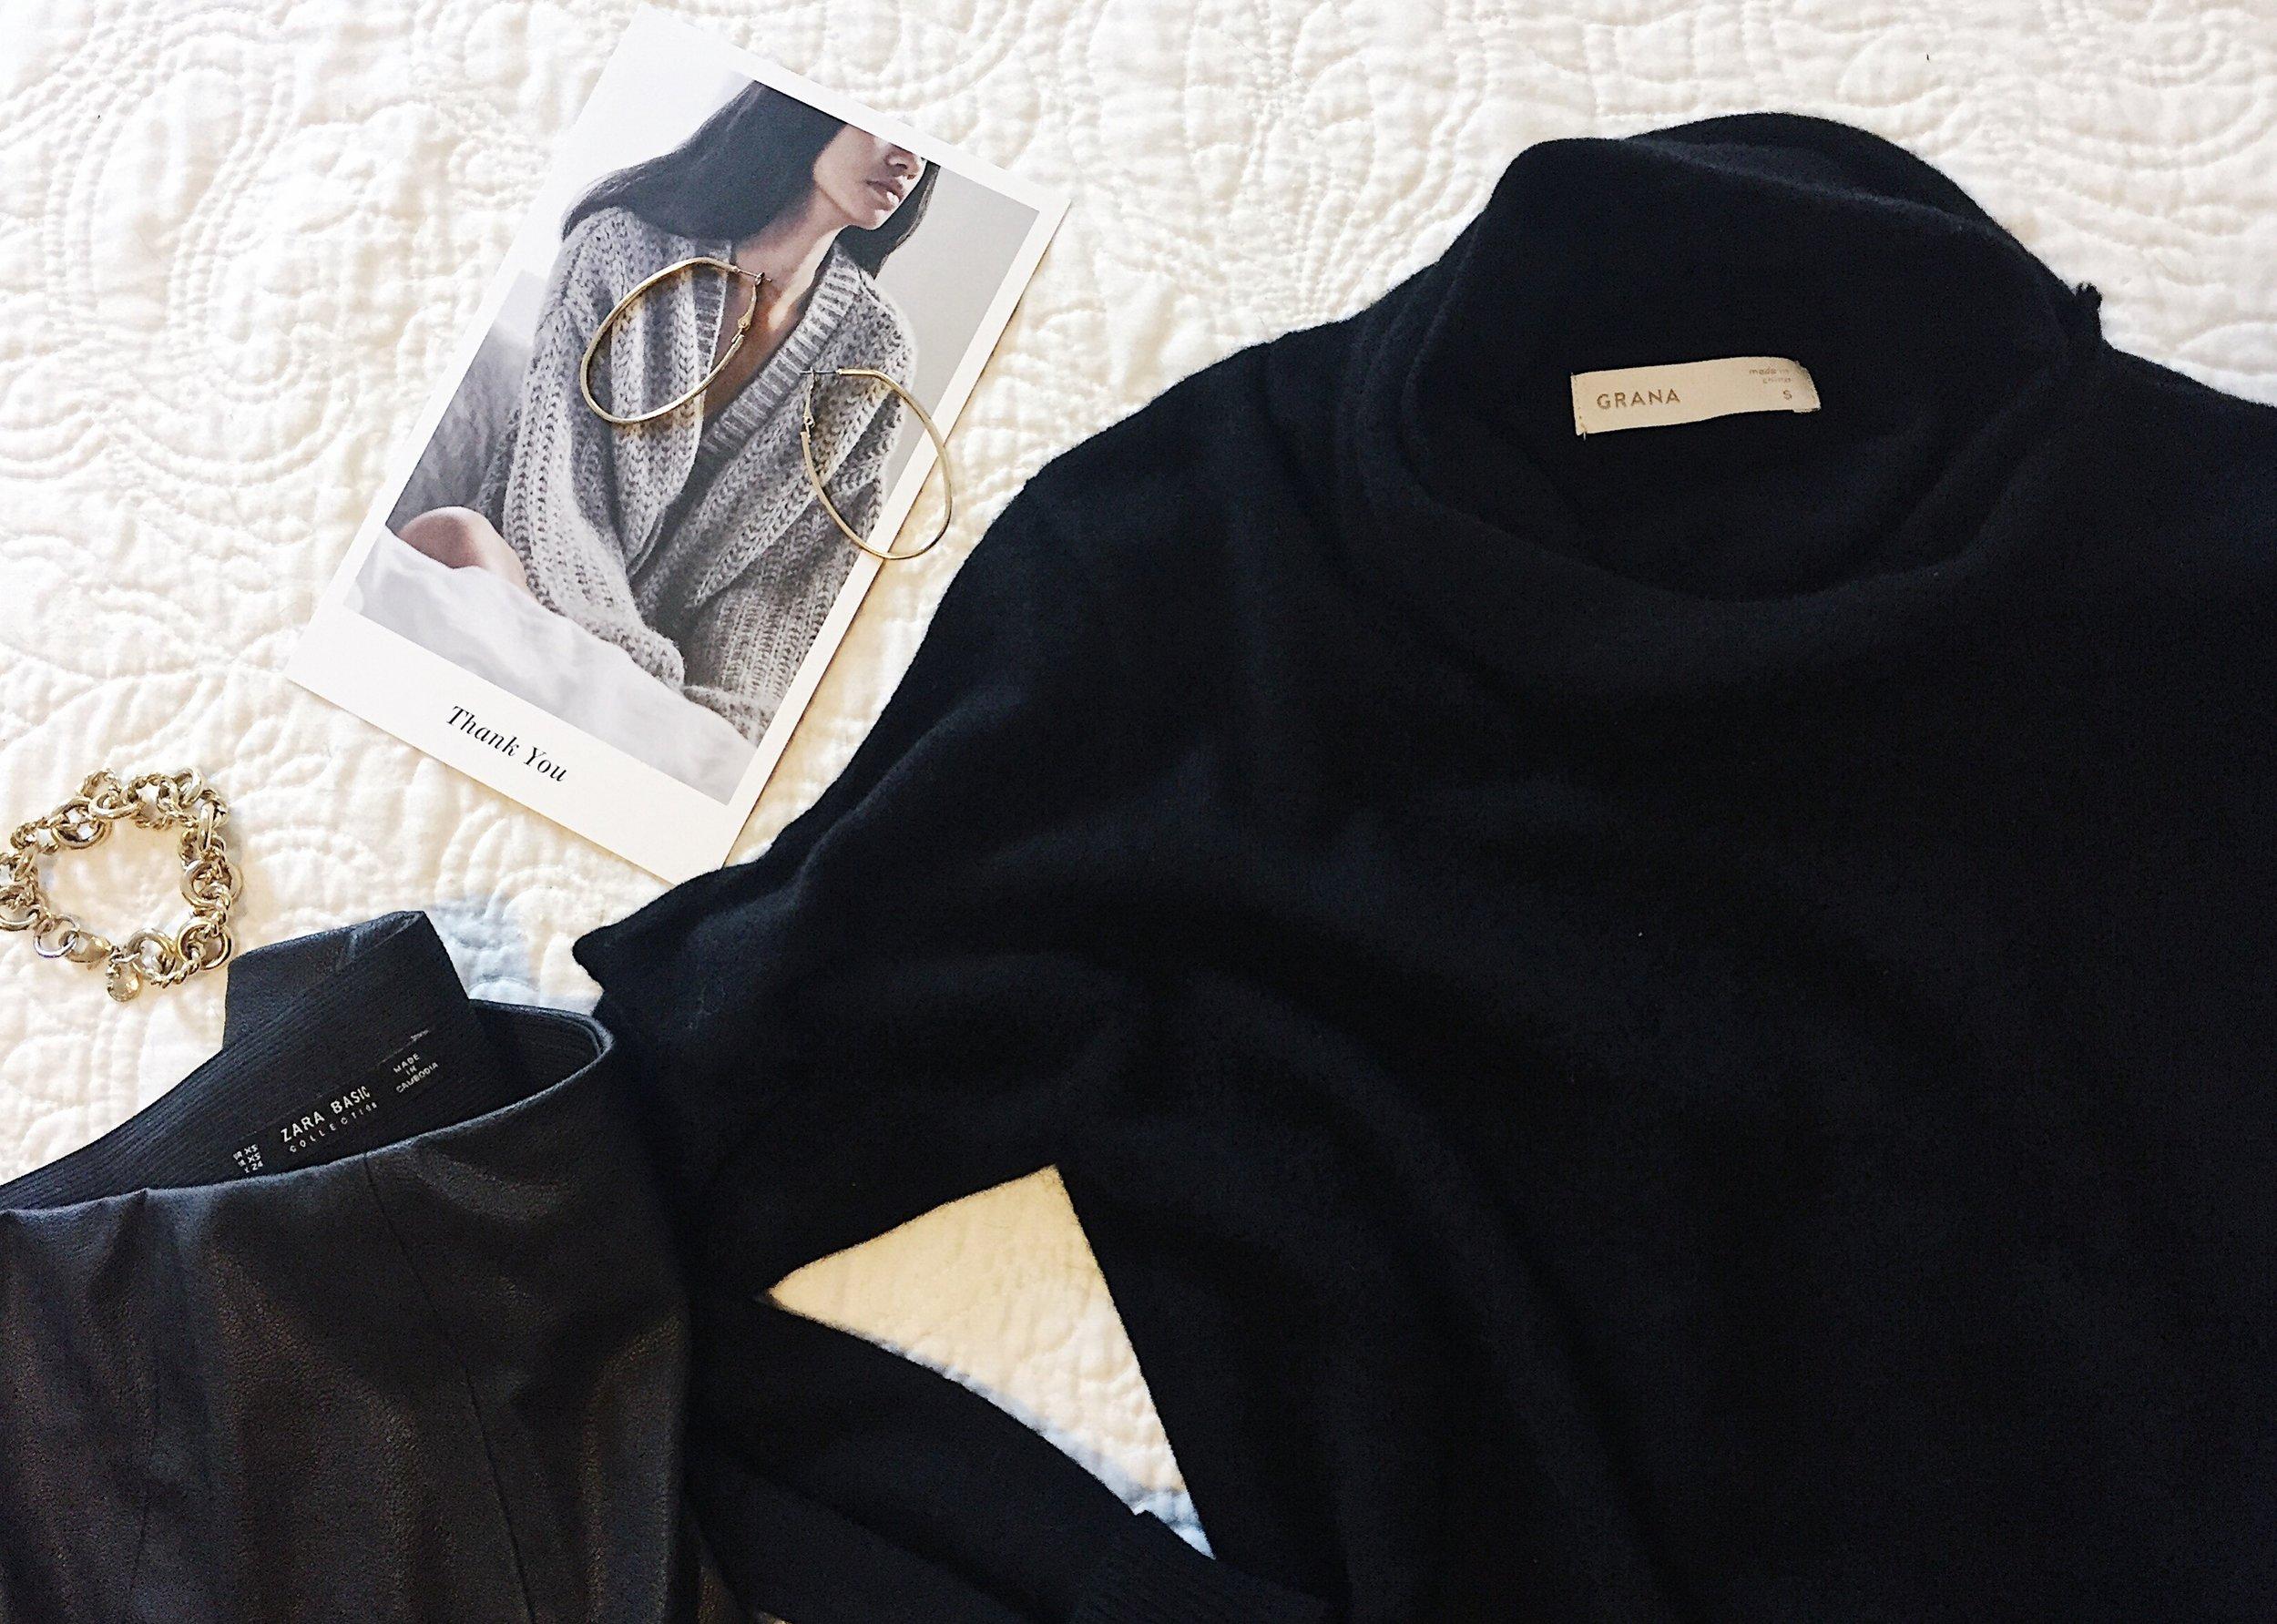 Grana_cashmere_grana_discount_code_fall_capsule_wardrobe_fall_fashion_haul.JPG